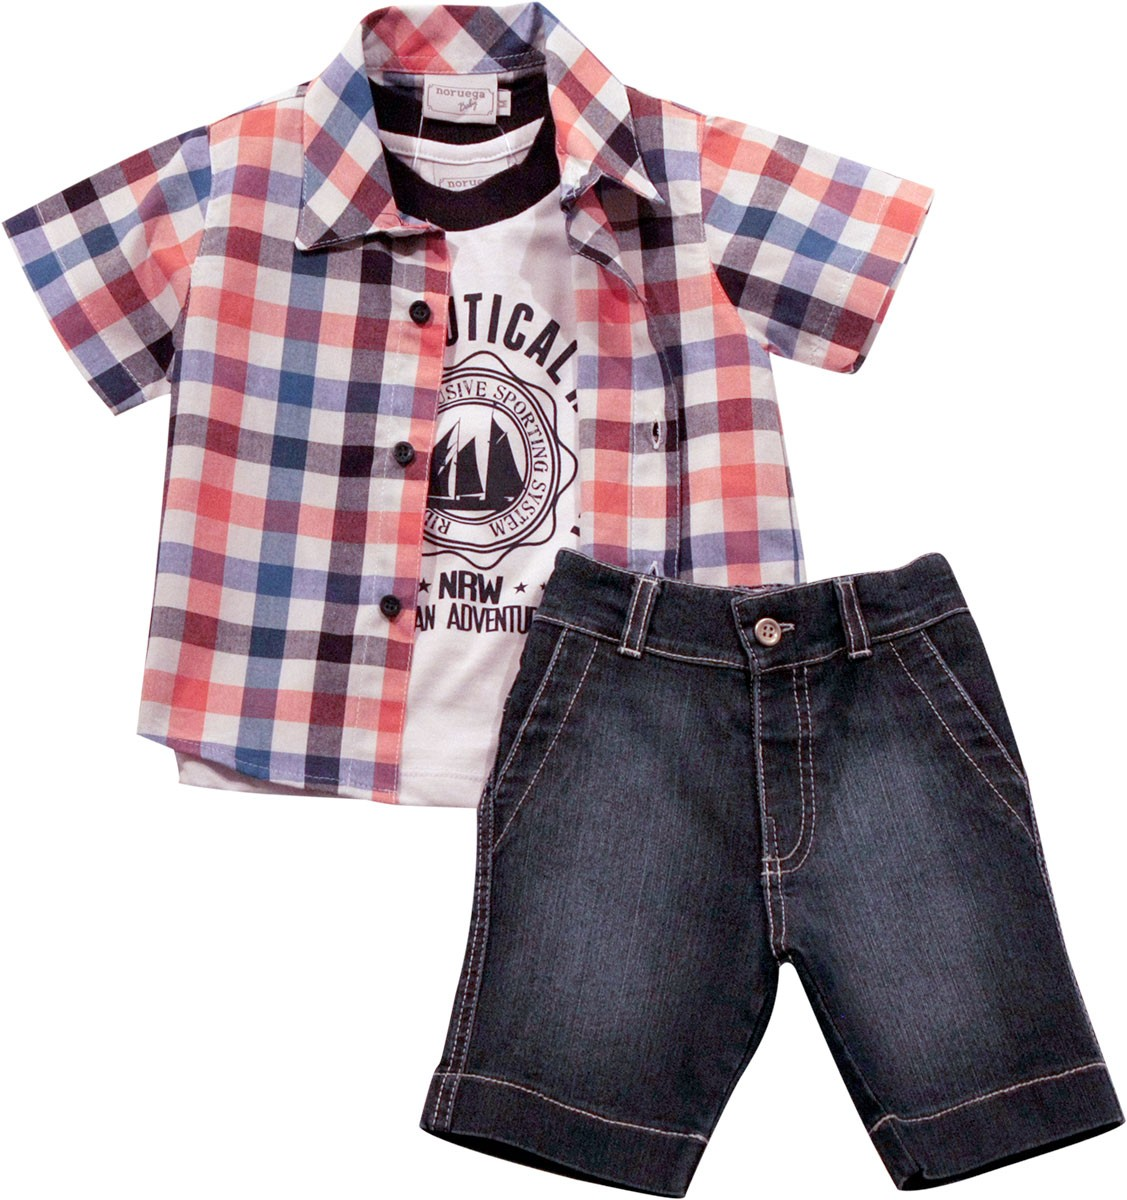 21.610 - Conjunto Camisa Xadrez